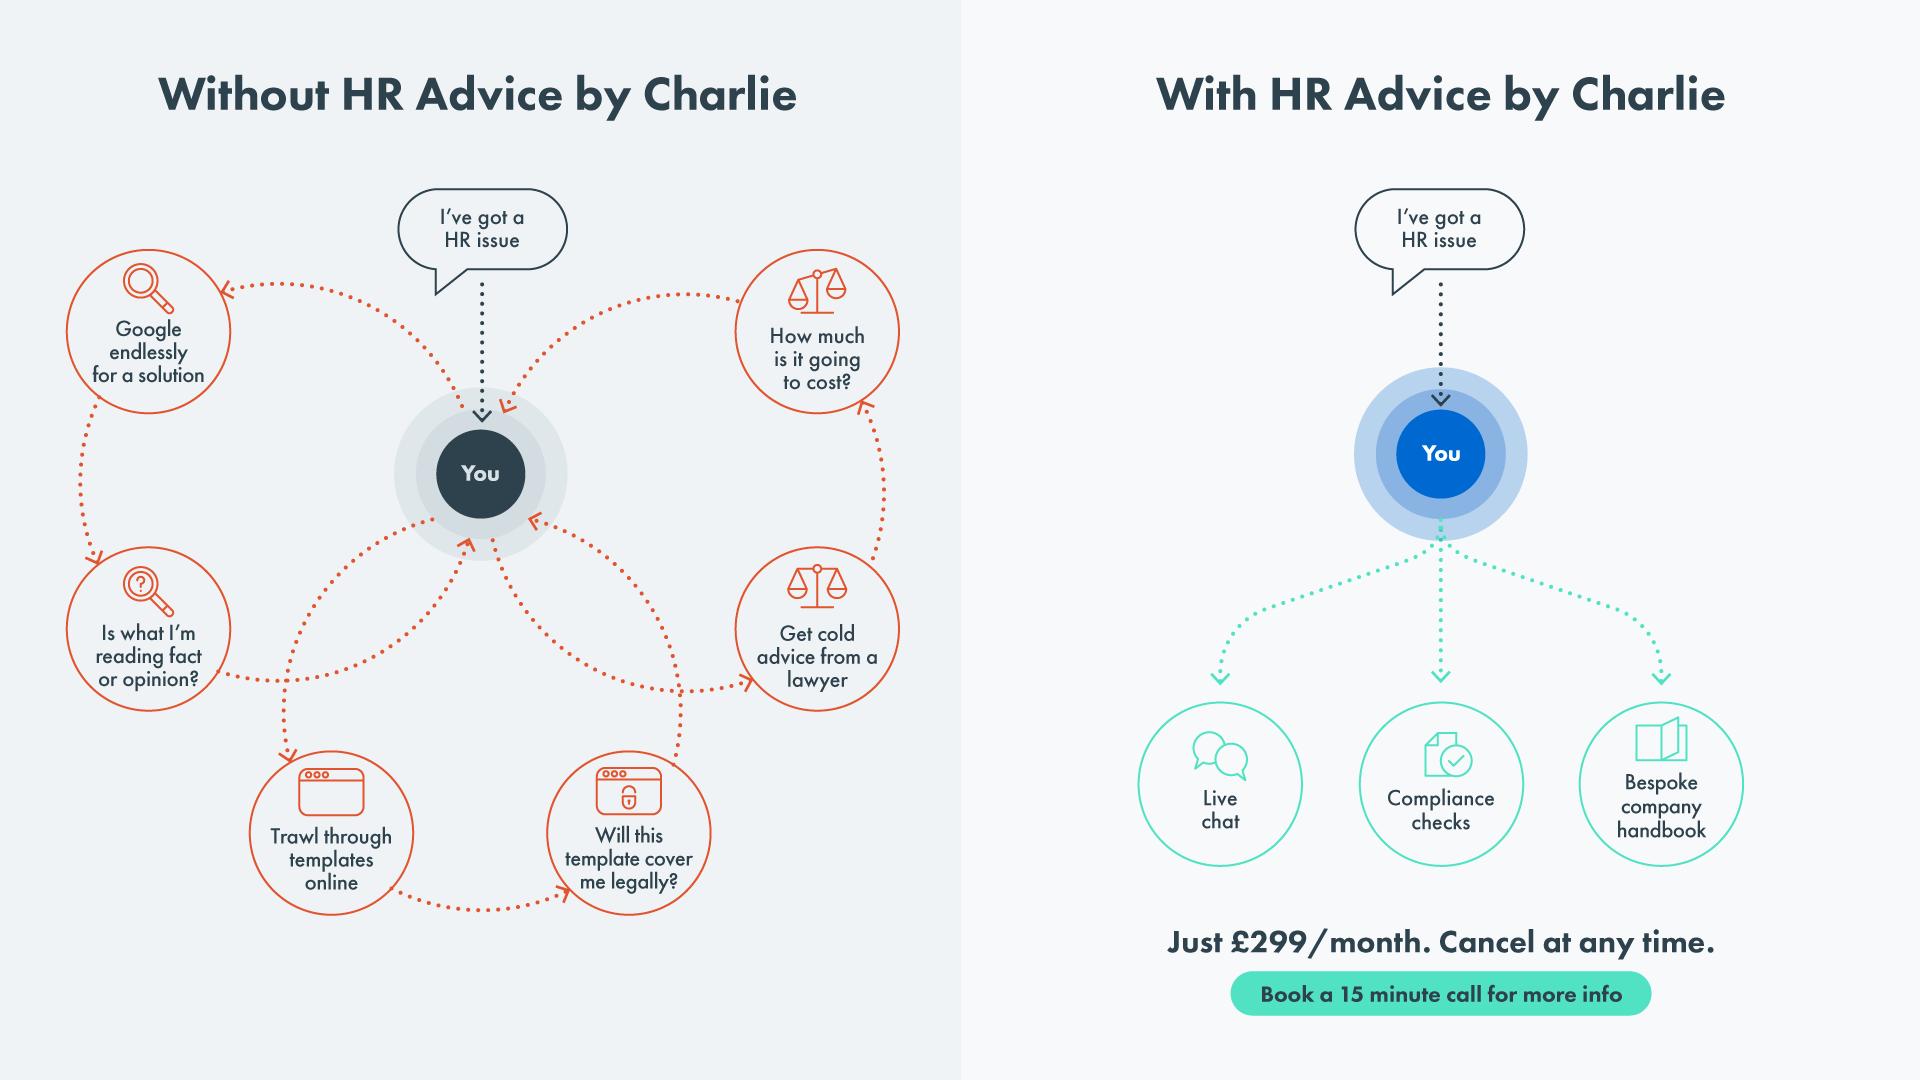 HR-Advice-Side-by-Side_1-1